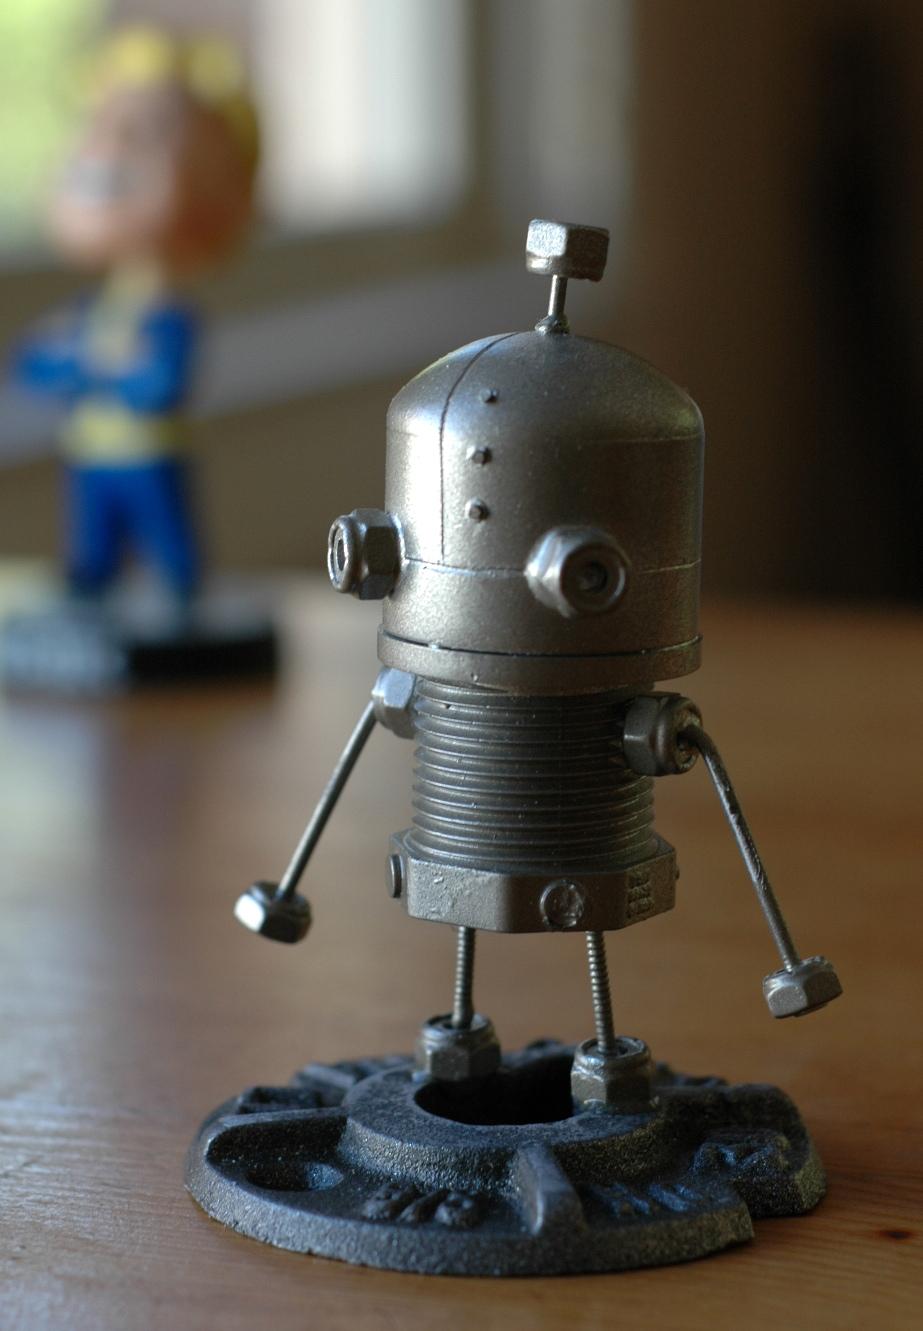 Josef the Robot (from Machinarium)